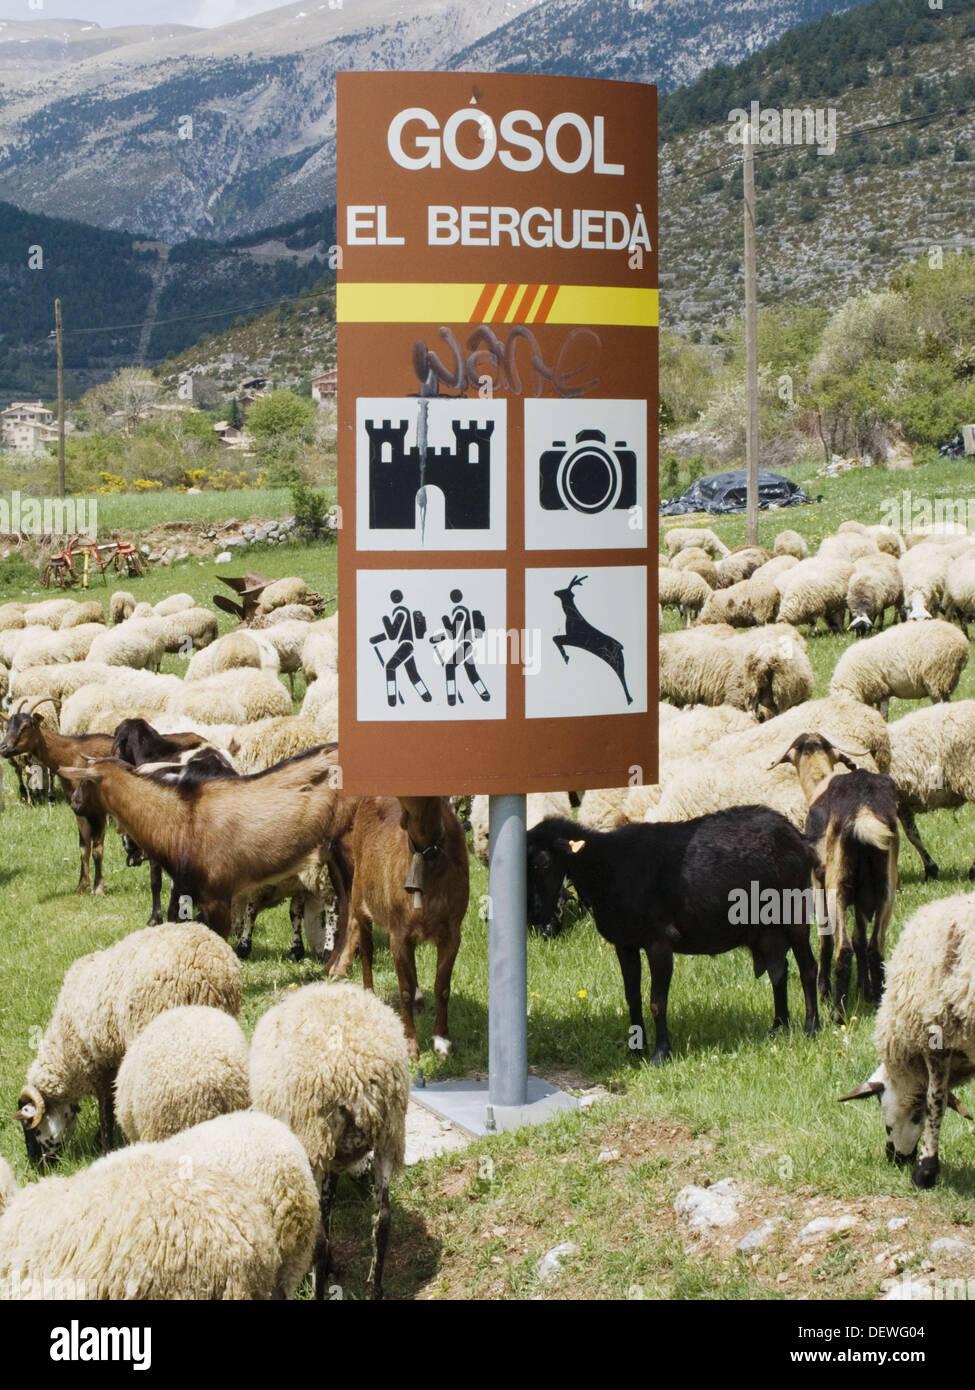 Schaf. Gósol. El Berguedà, Katalonien. Spanien. Pfad der guten Männer (Camí Dels Bons Häuser). Route der Katharer. Mountain-Bike. Stockbild